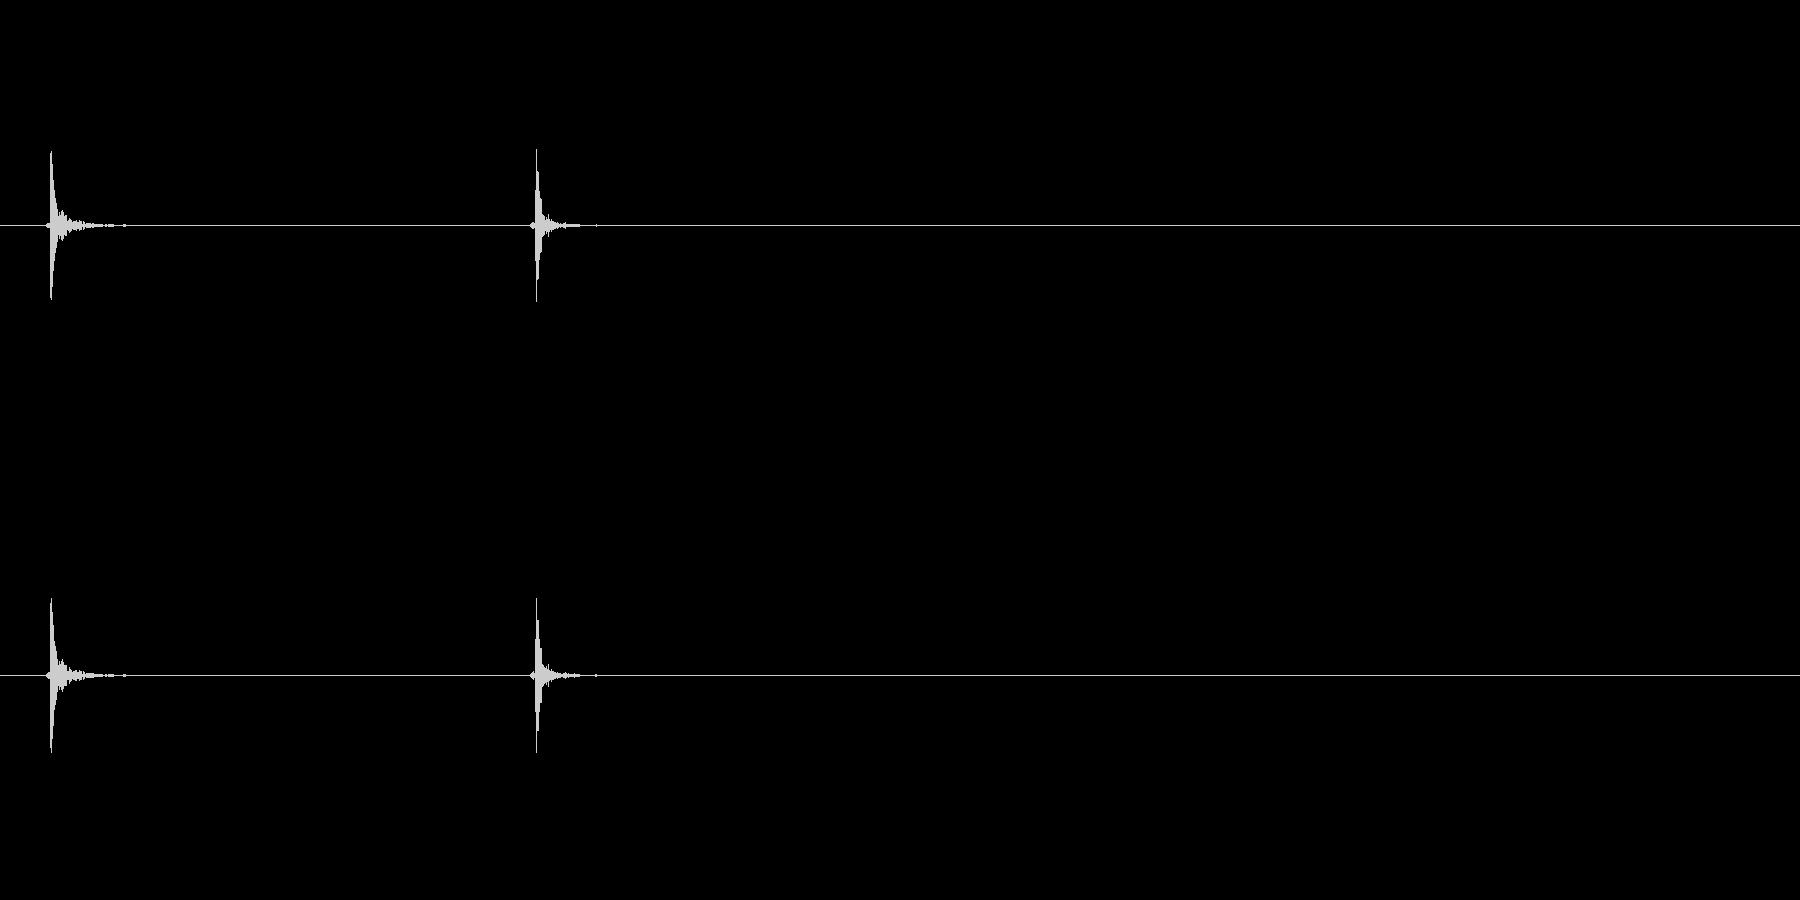 【PC マウス01-5】の未再生の波形